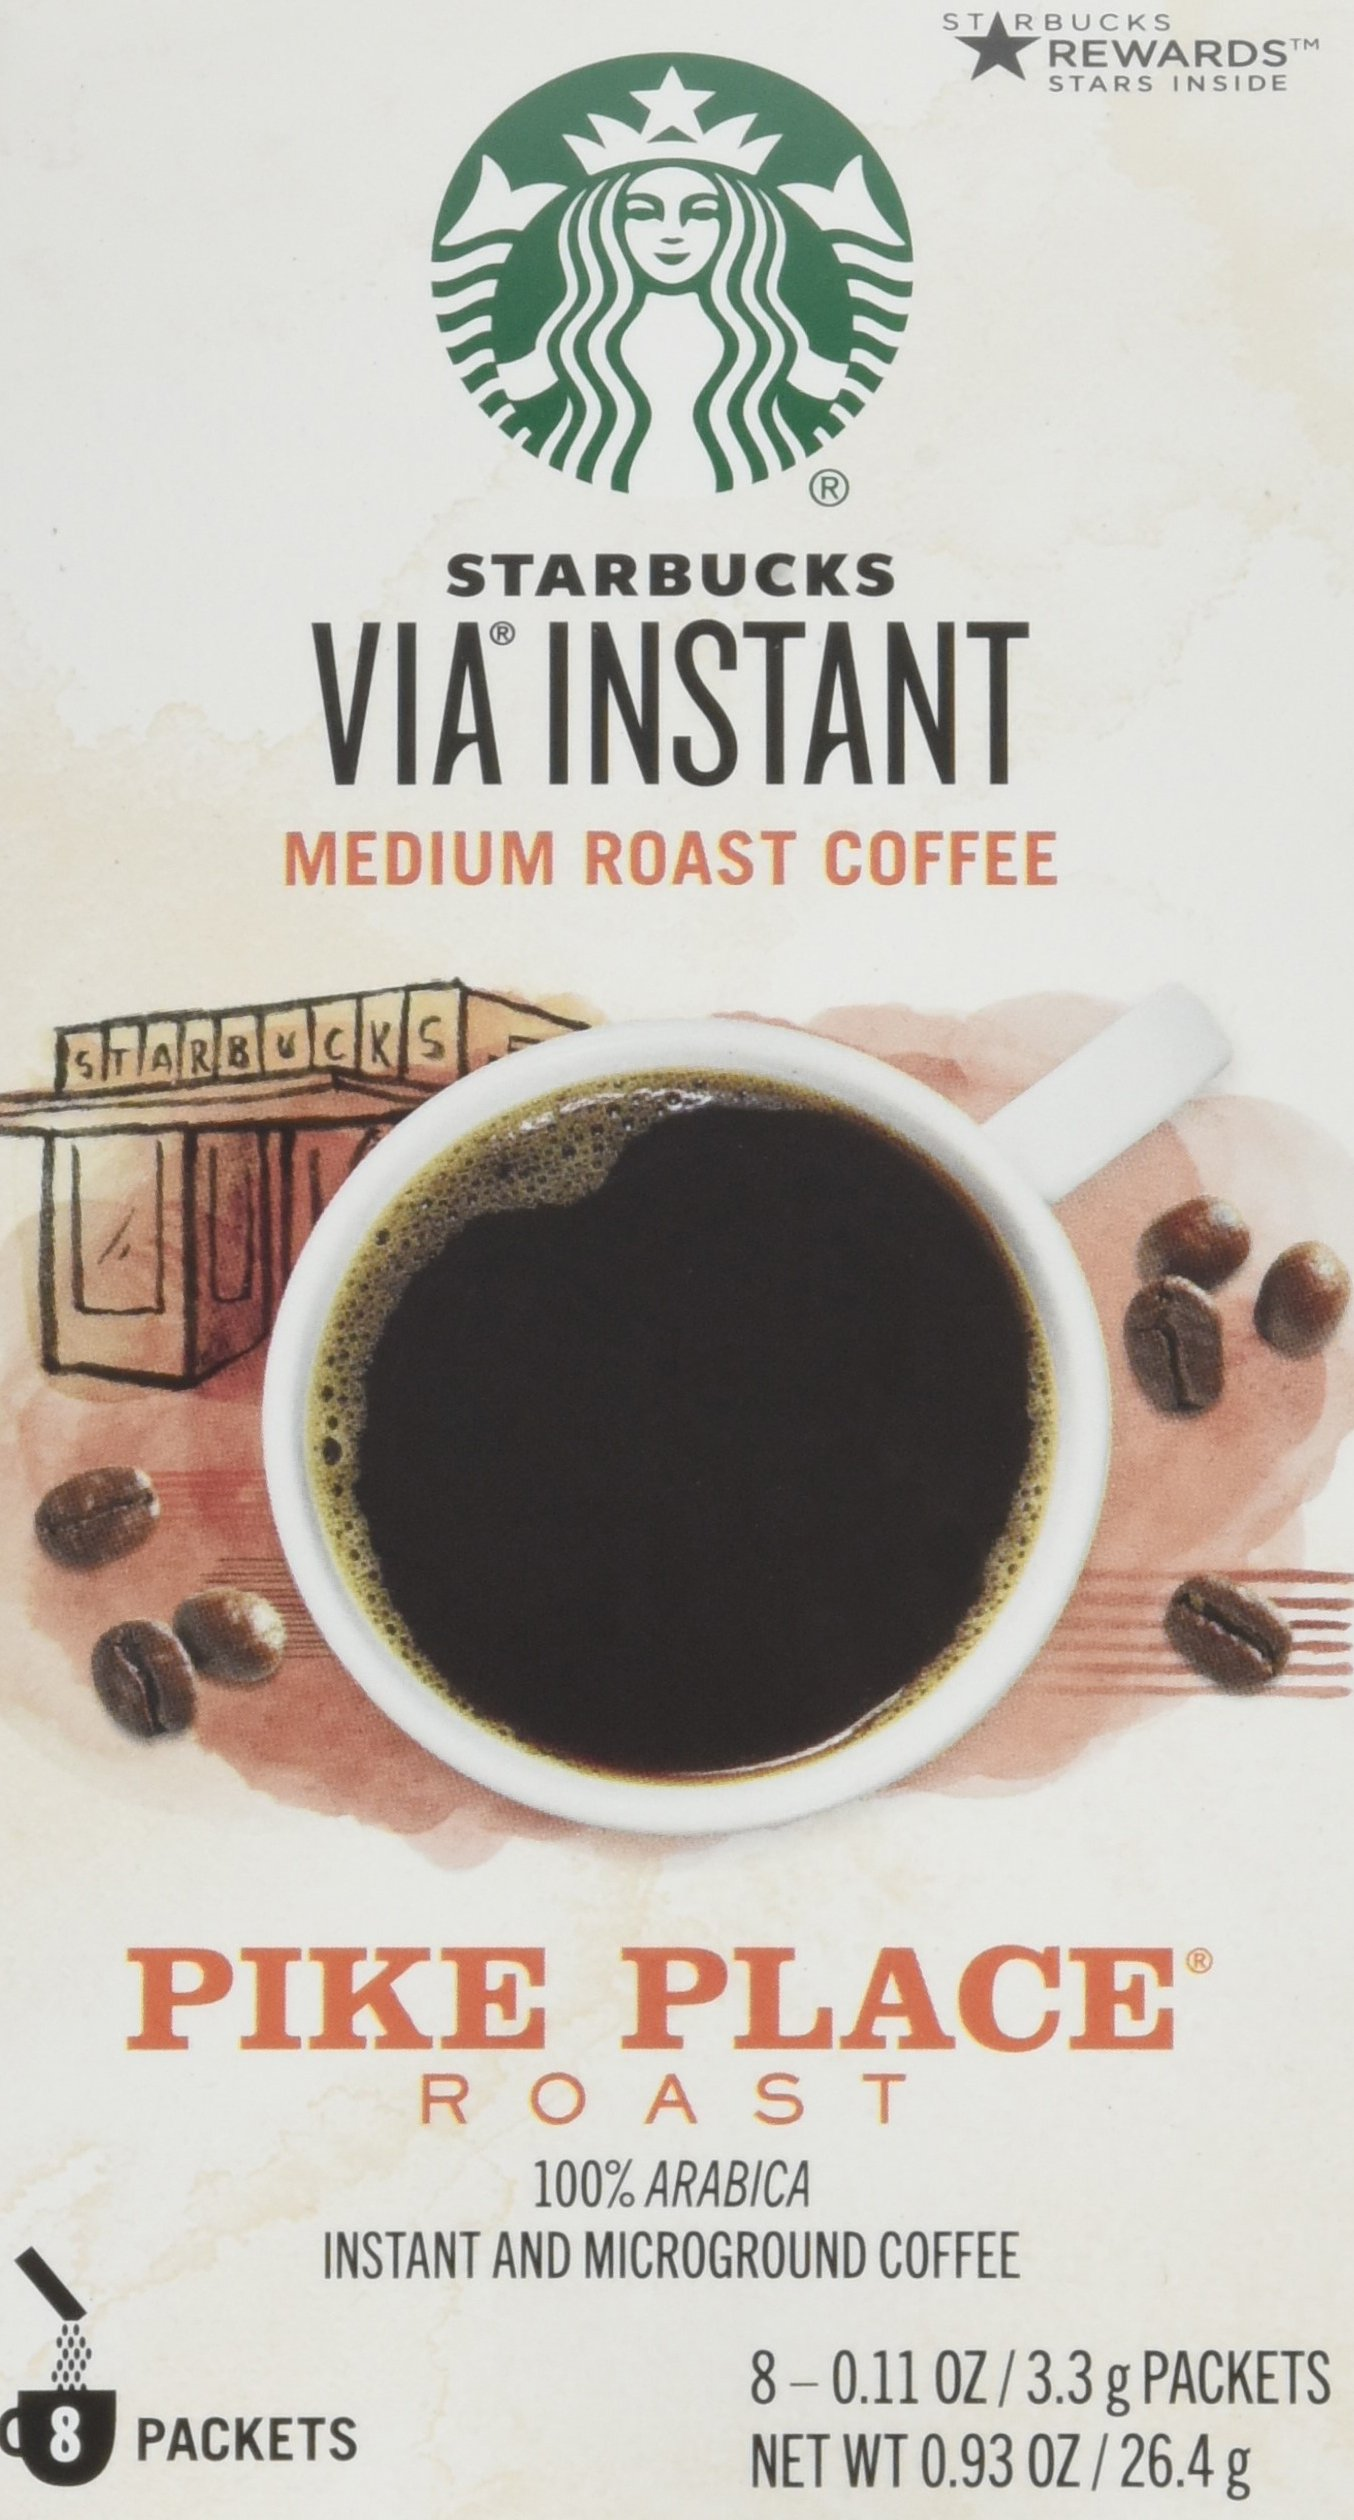 Starbucks Via Instant Medium Roast Coffee Pike Place Roast 100% ARABICA 8 Packets (Pack of 4)8-0.11oz